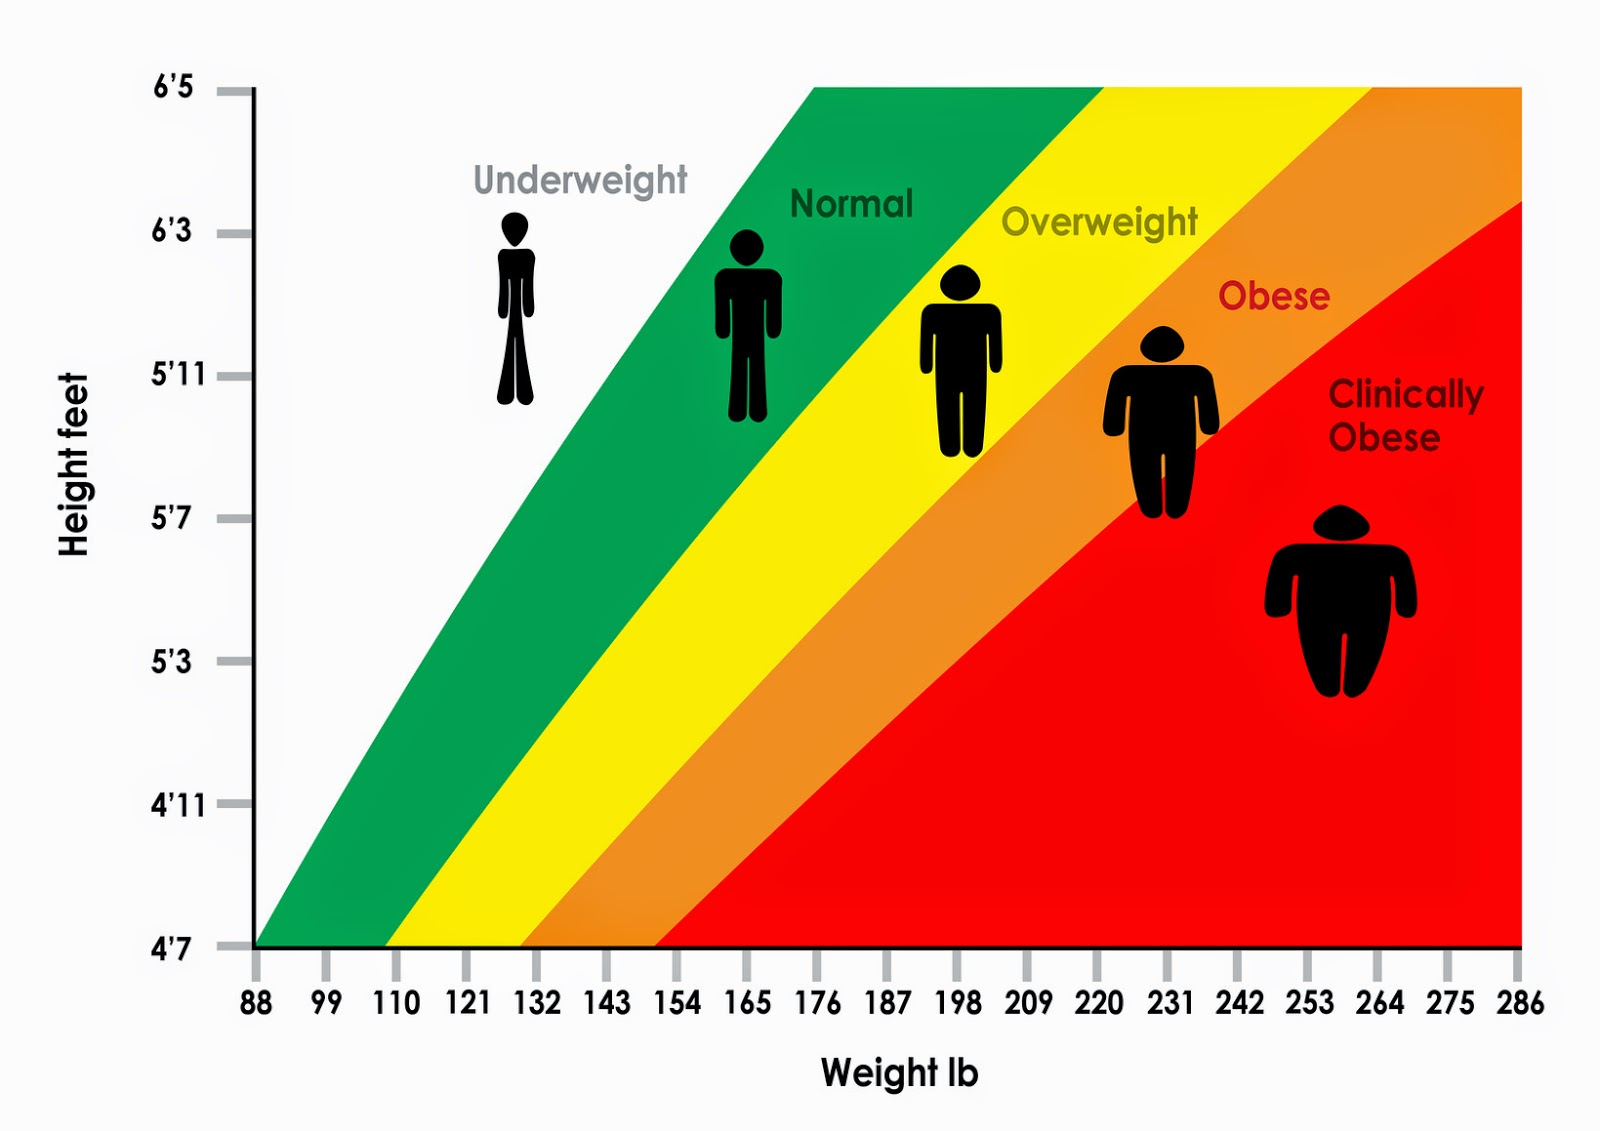 Baruna - Dislipidemia Dan Manajemen Berat Badan